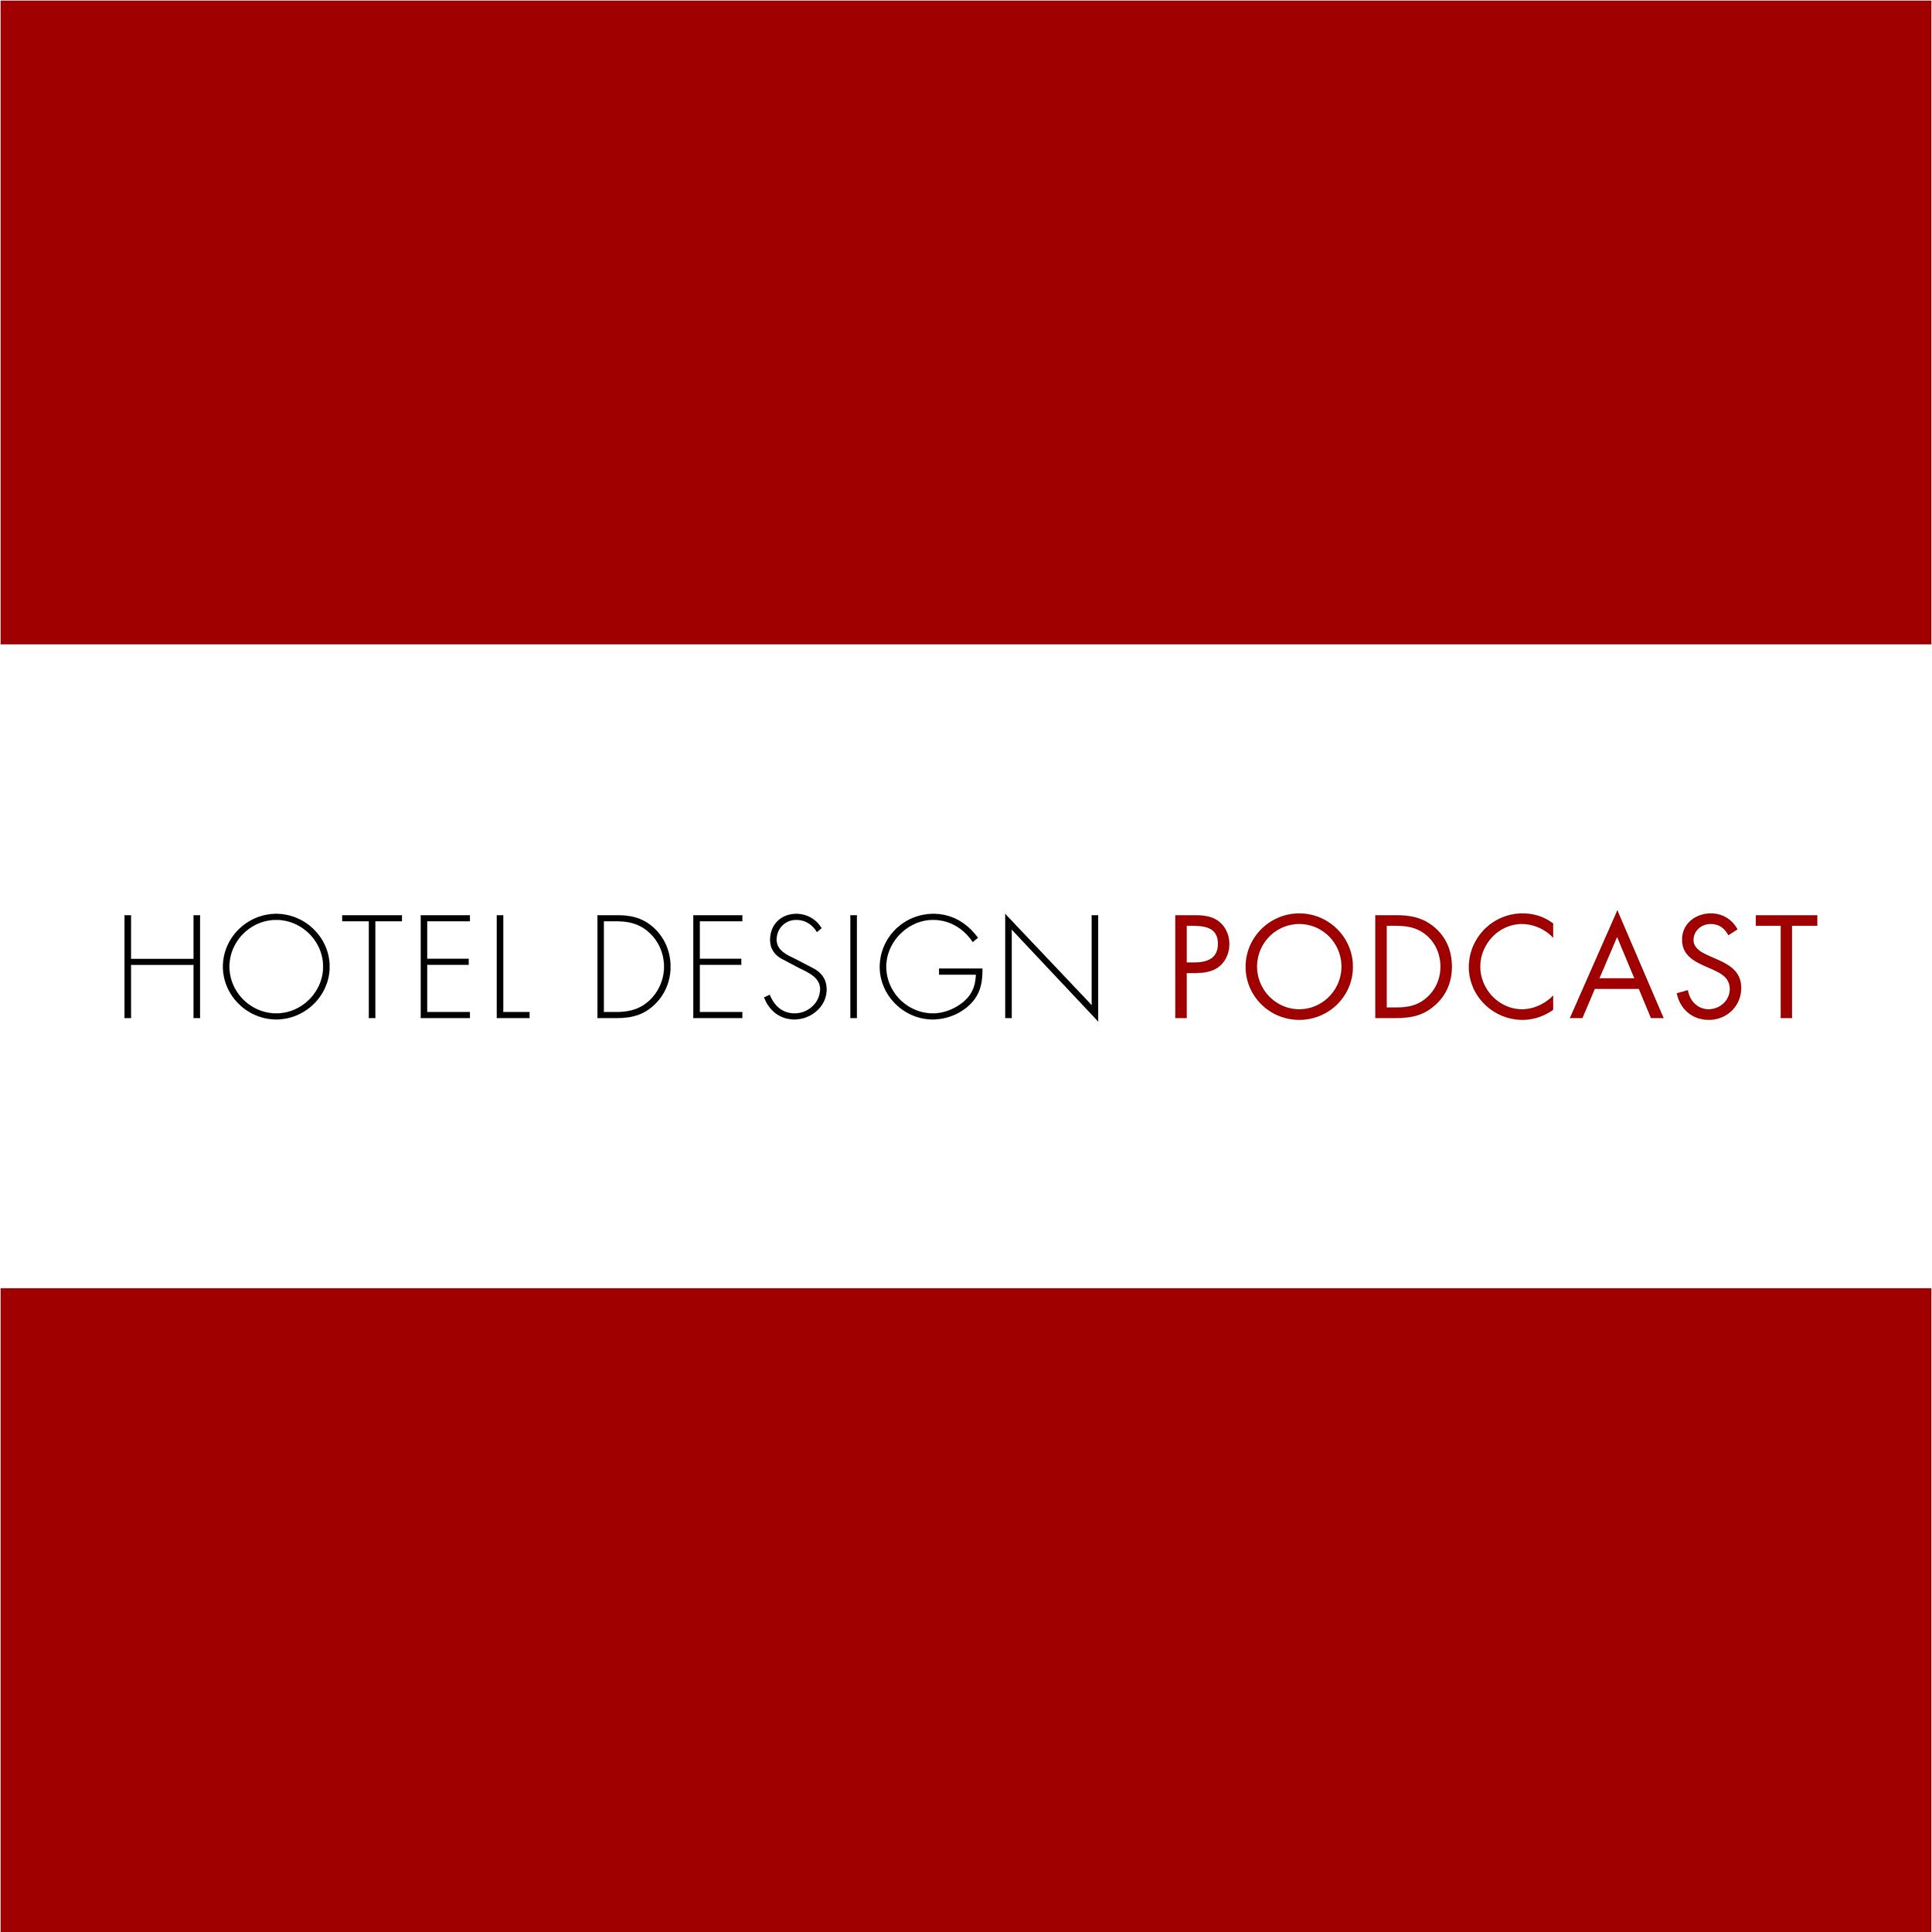 Hotel Design Podcast show art